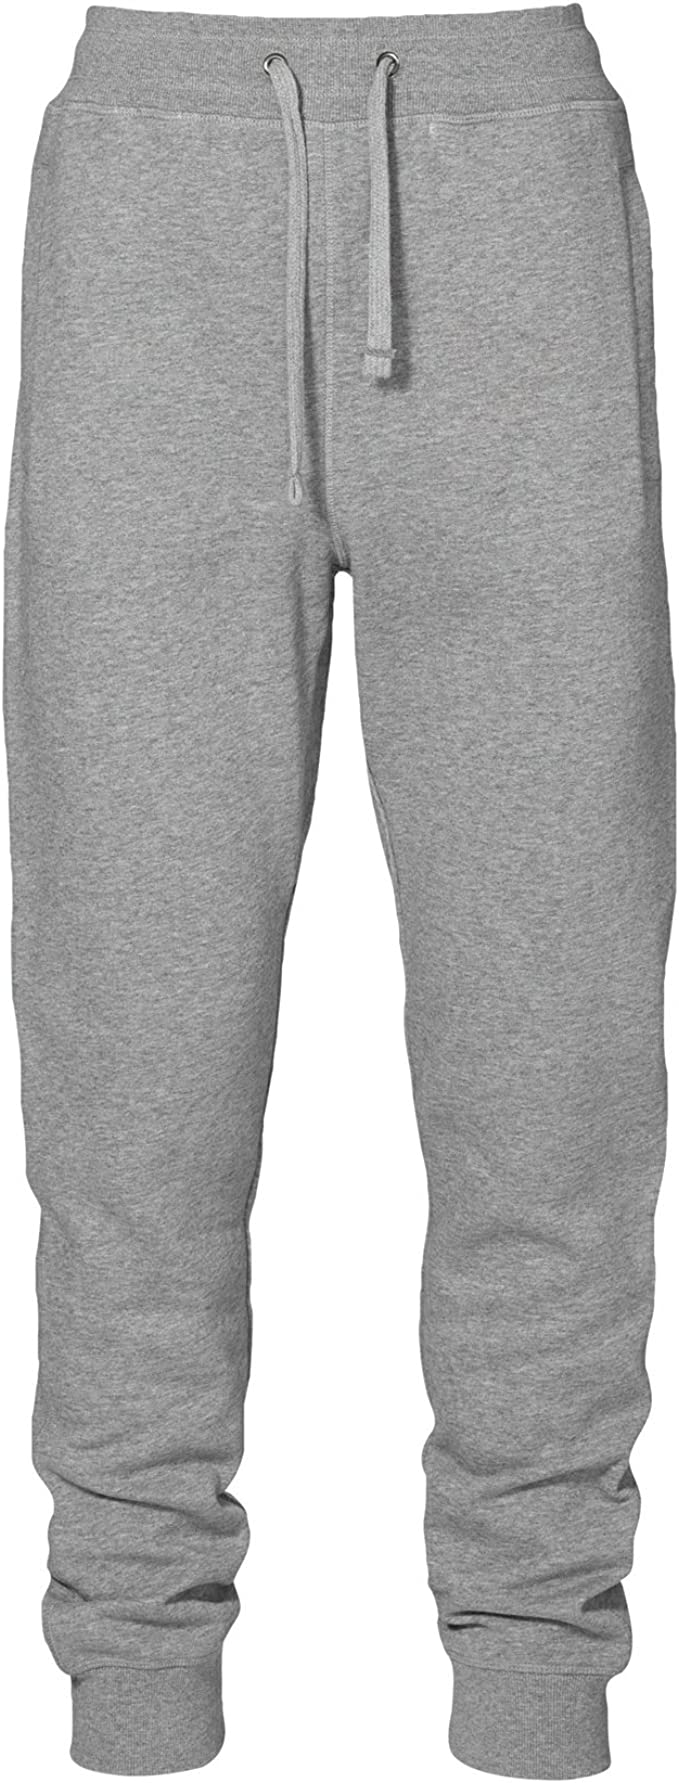 ID - Pantalones de chandal Modelo Jogging ajustados hombre ...